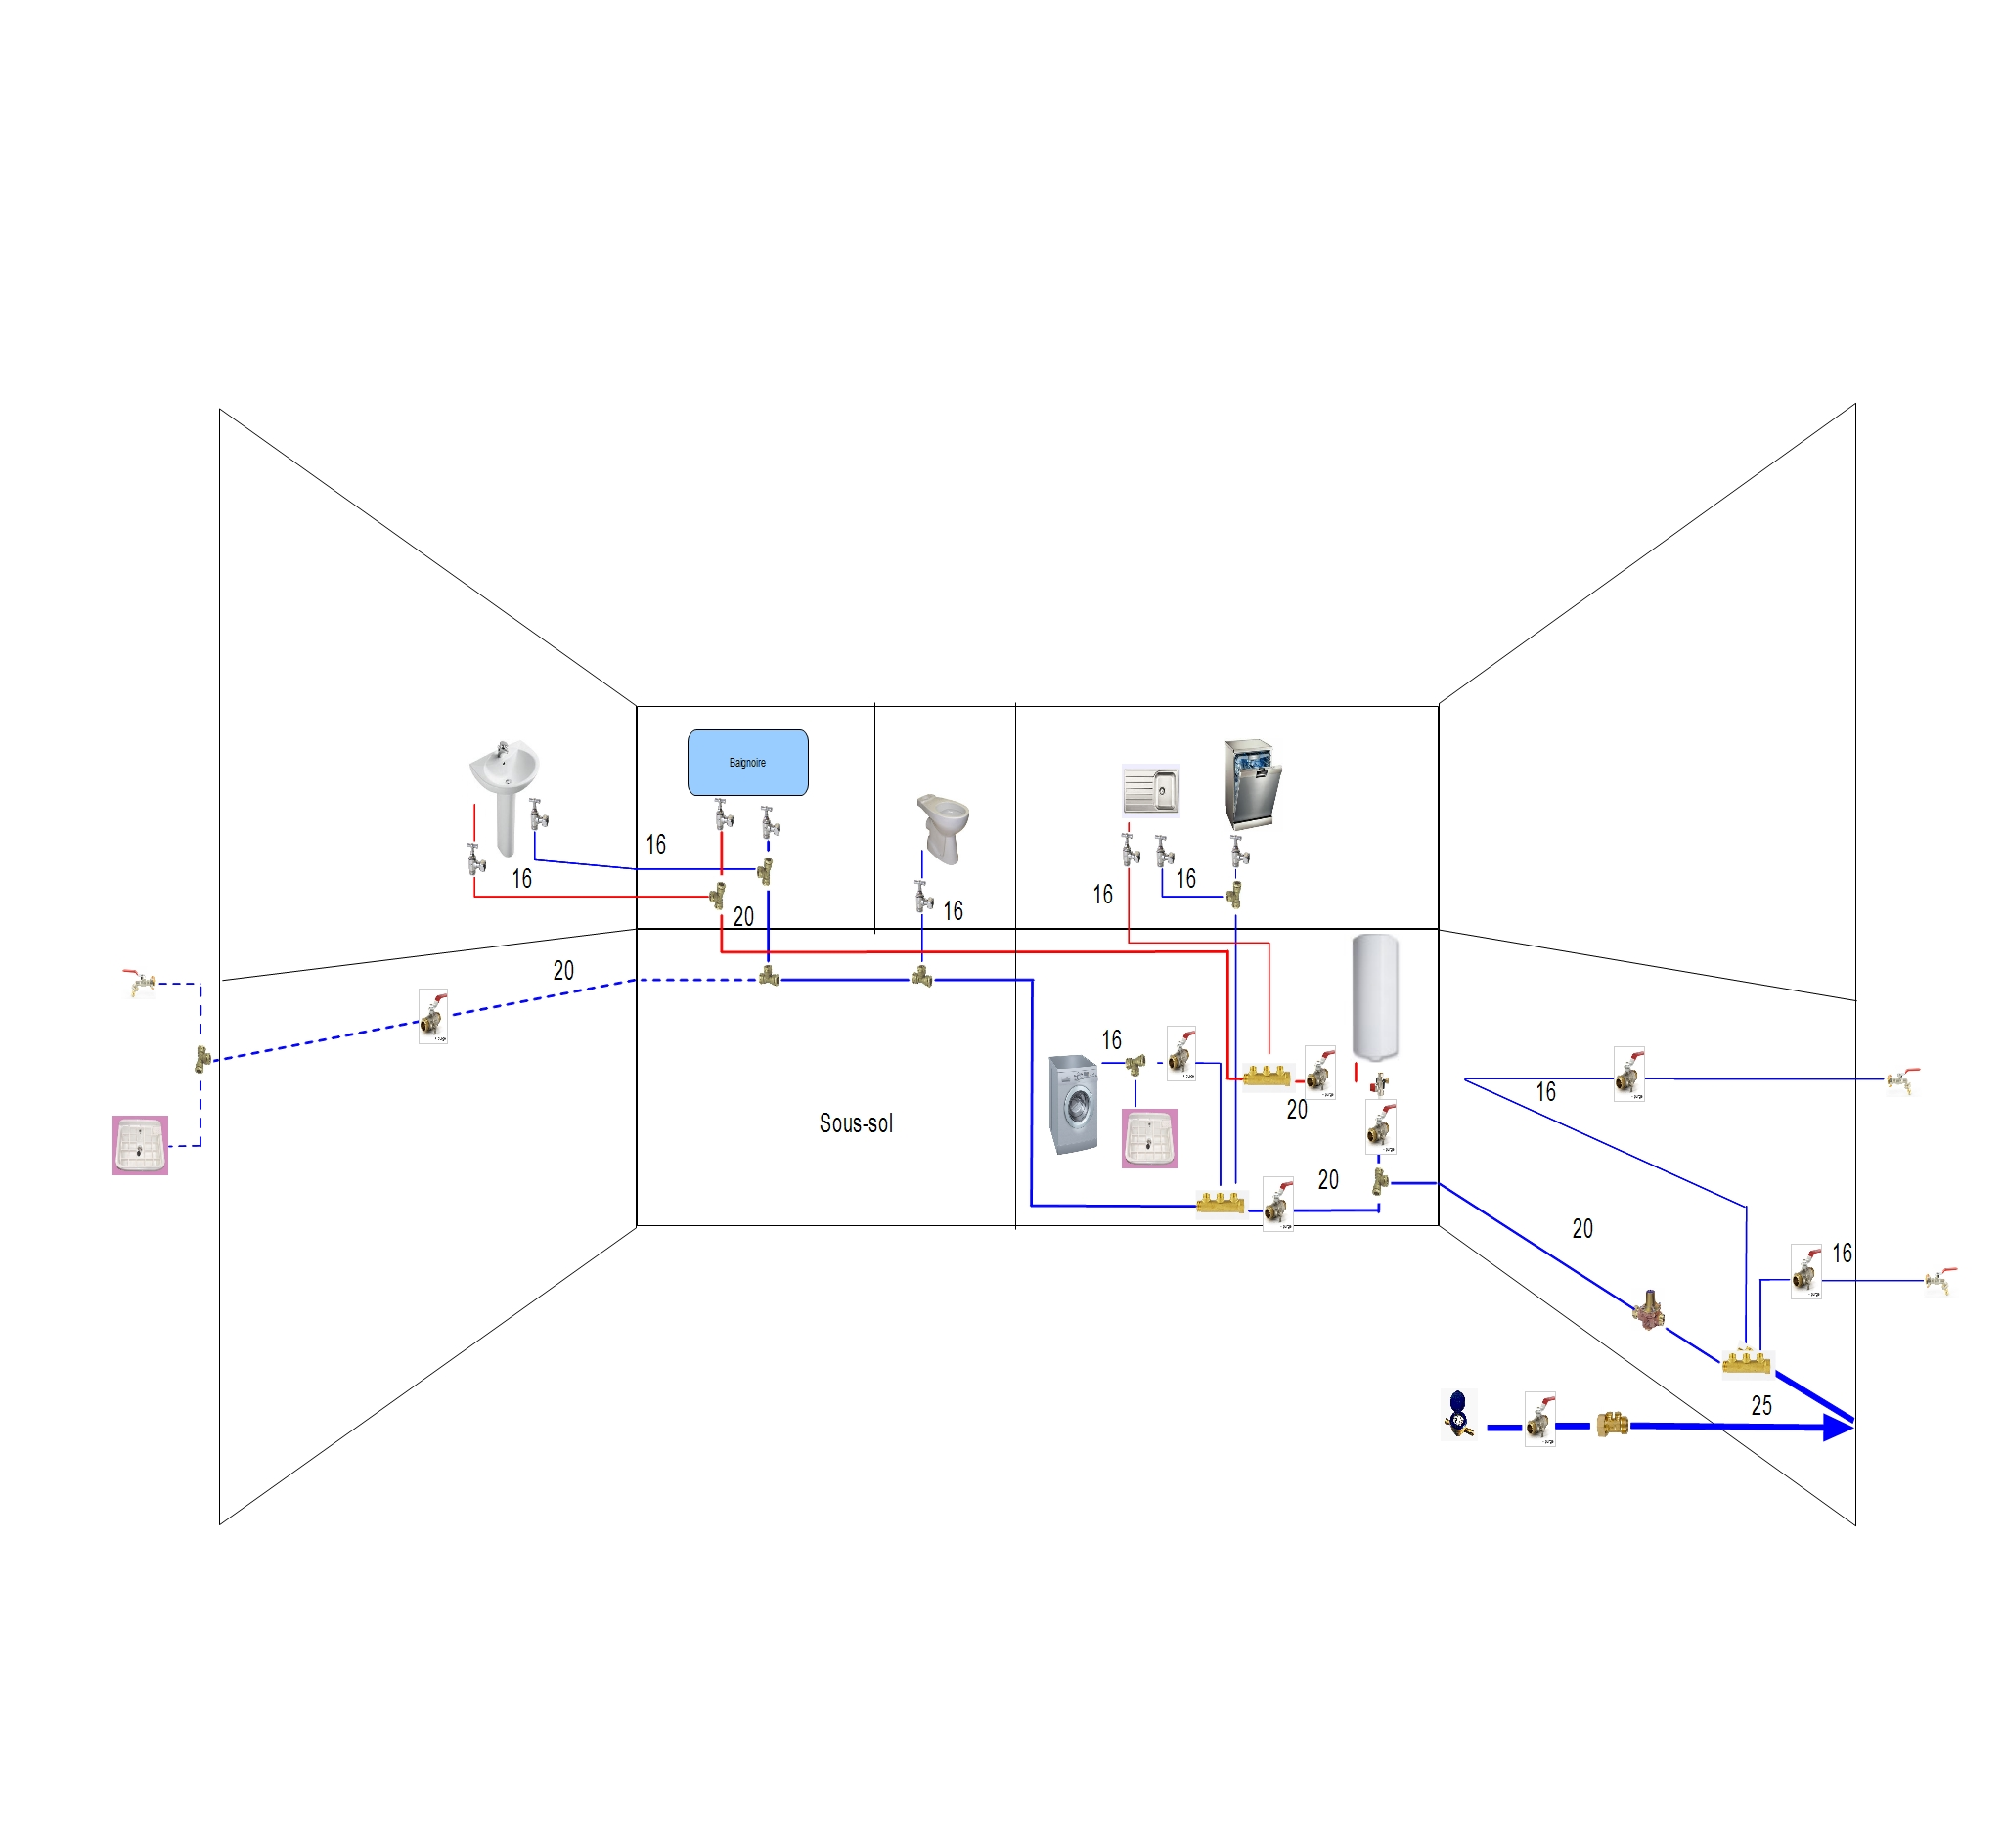 Plan eau multicouche à envoyer 2.jpg, 222.16 kb, 2048 x 1890